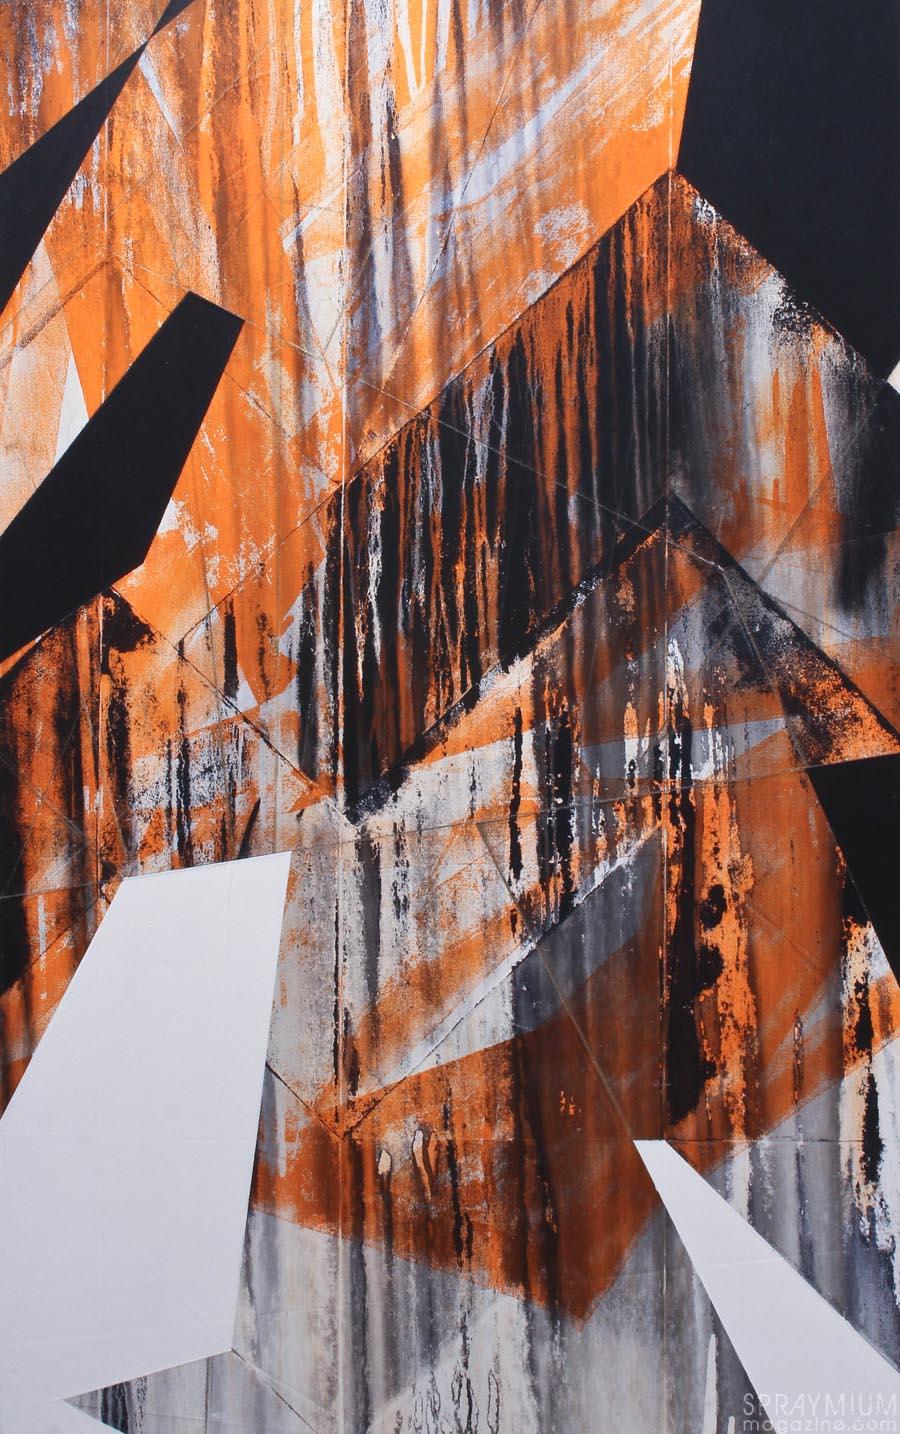 lek dmv damentalvaporz frenchkiss galerie 42b XIX paris villa medicis graffiti postgraffiti graffuturism streetart atelier canvas spraymium exposition abstract painting